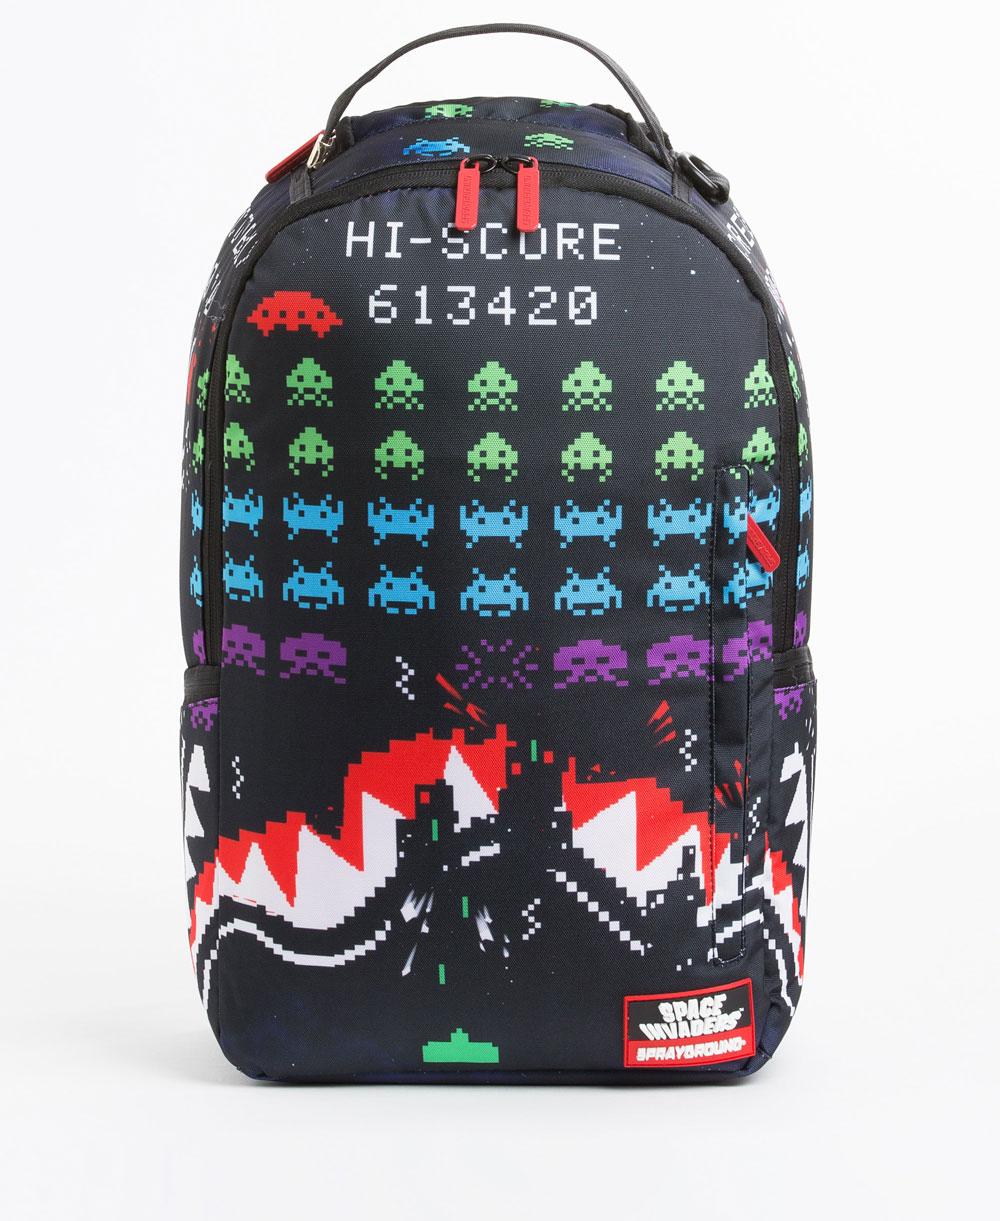 cebc5147b Sprayground Shark Space Invaders 40th Anniversary Backpack